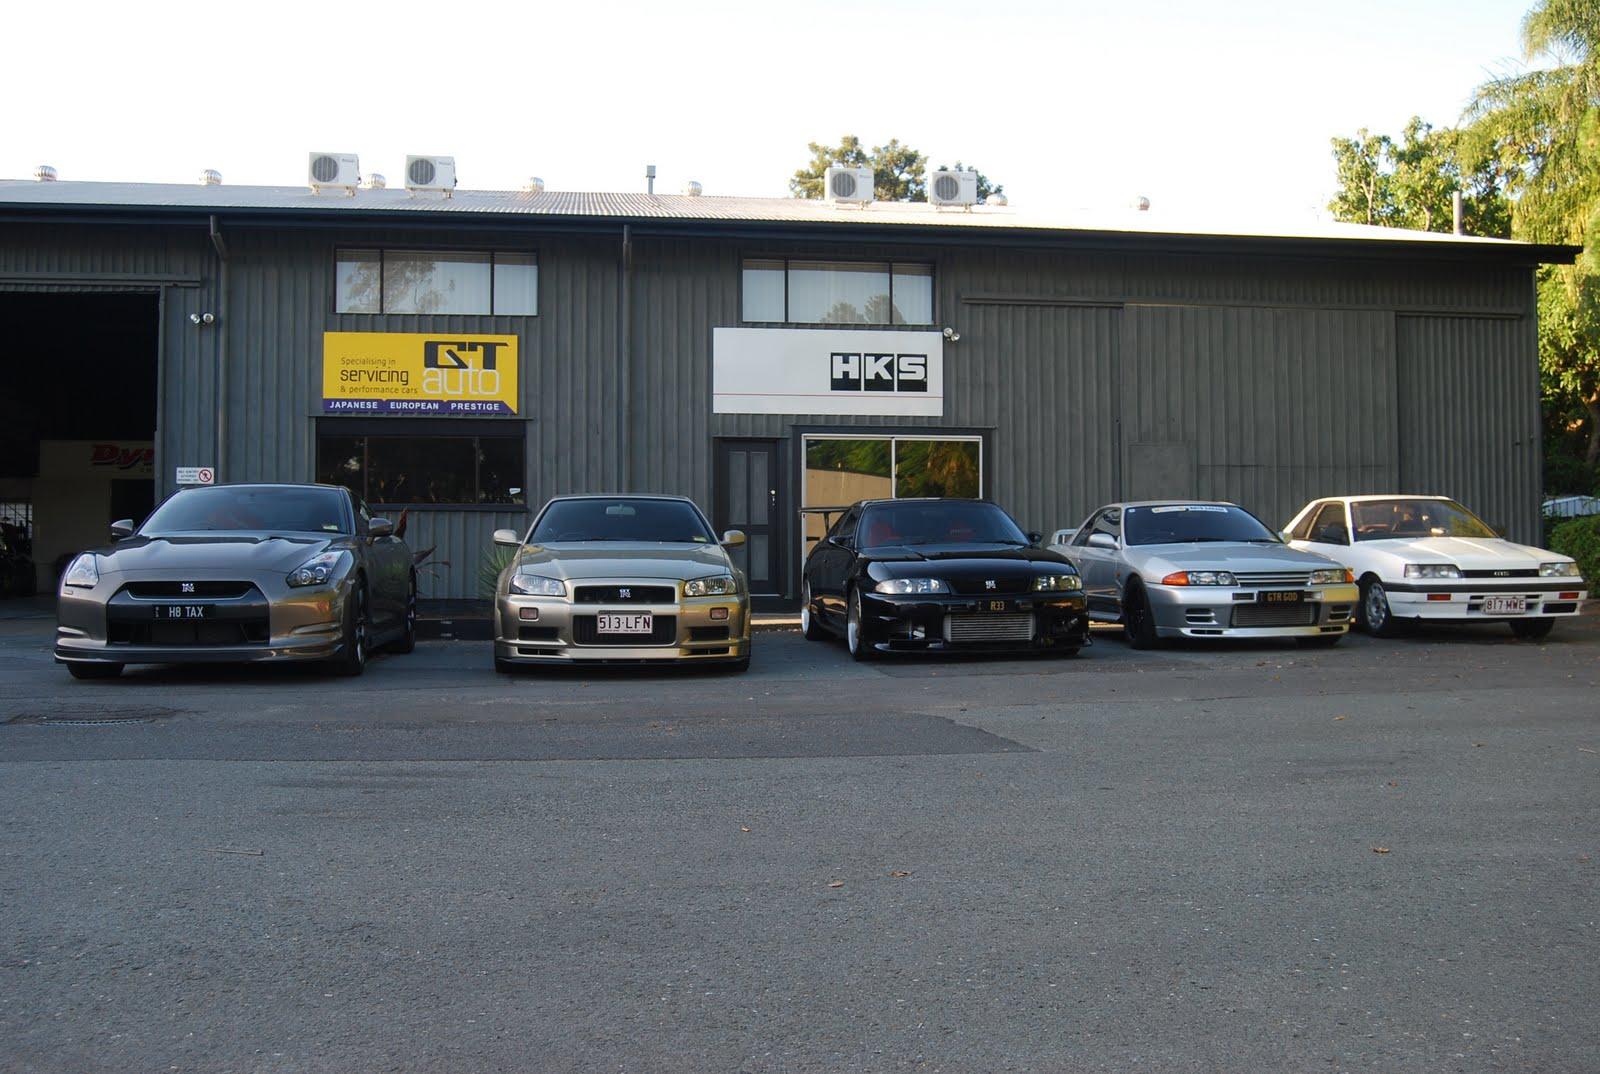 Gt auto garage r35 gtr gt600 project for Garage gt auto